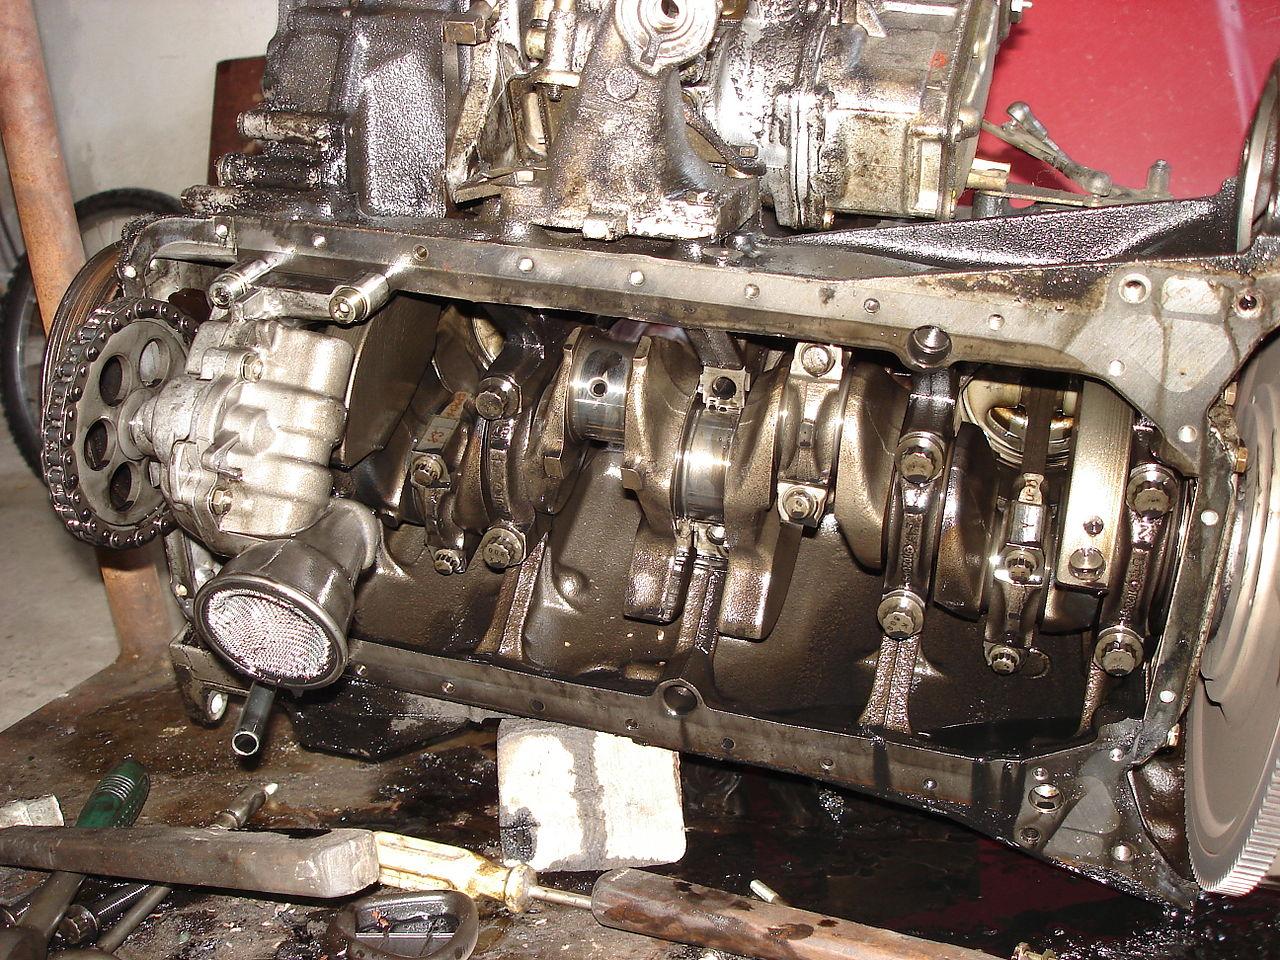 File:Mercedes Benz OM601 Diesel Engine Crankshaft Compartment.JPG